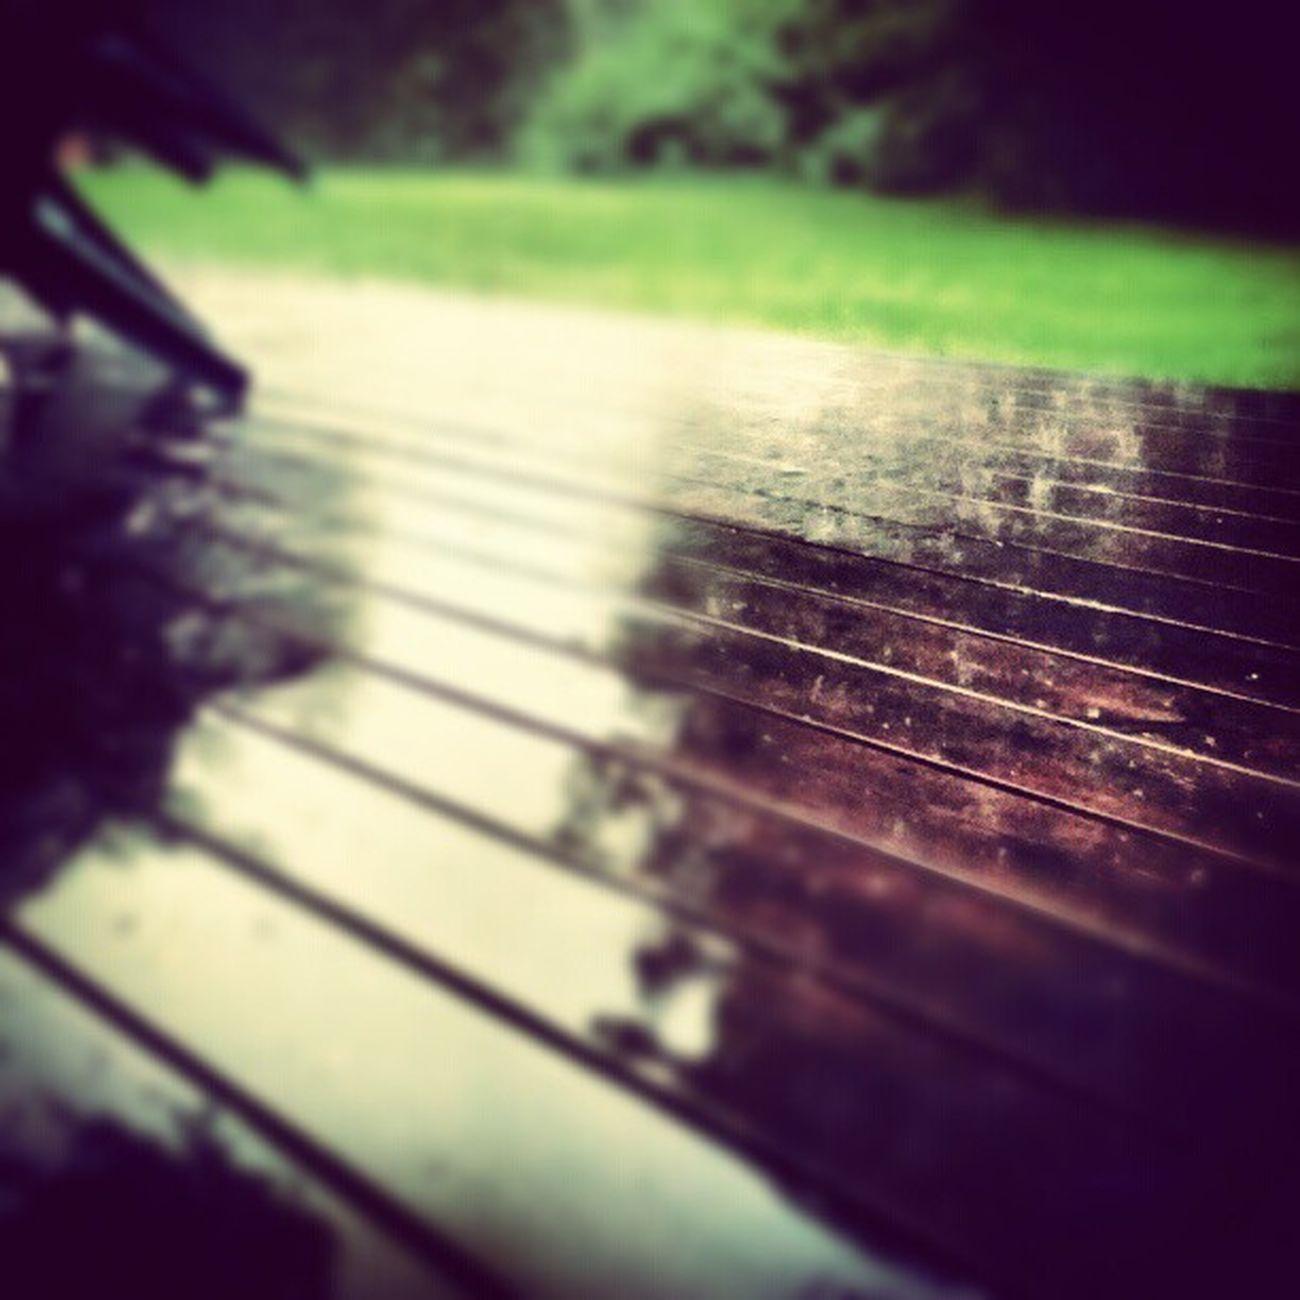 Det typ regnar ute. Regn  öser Ner Rain